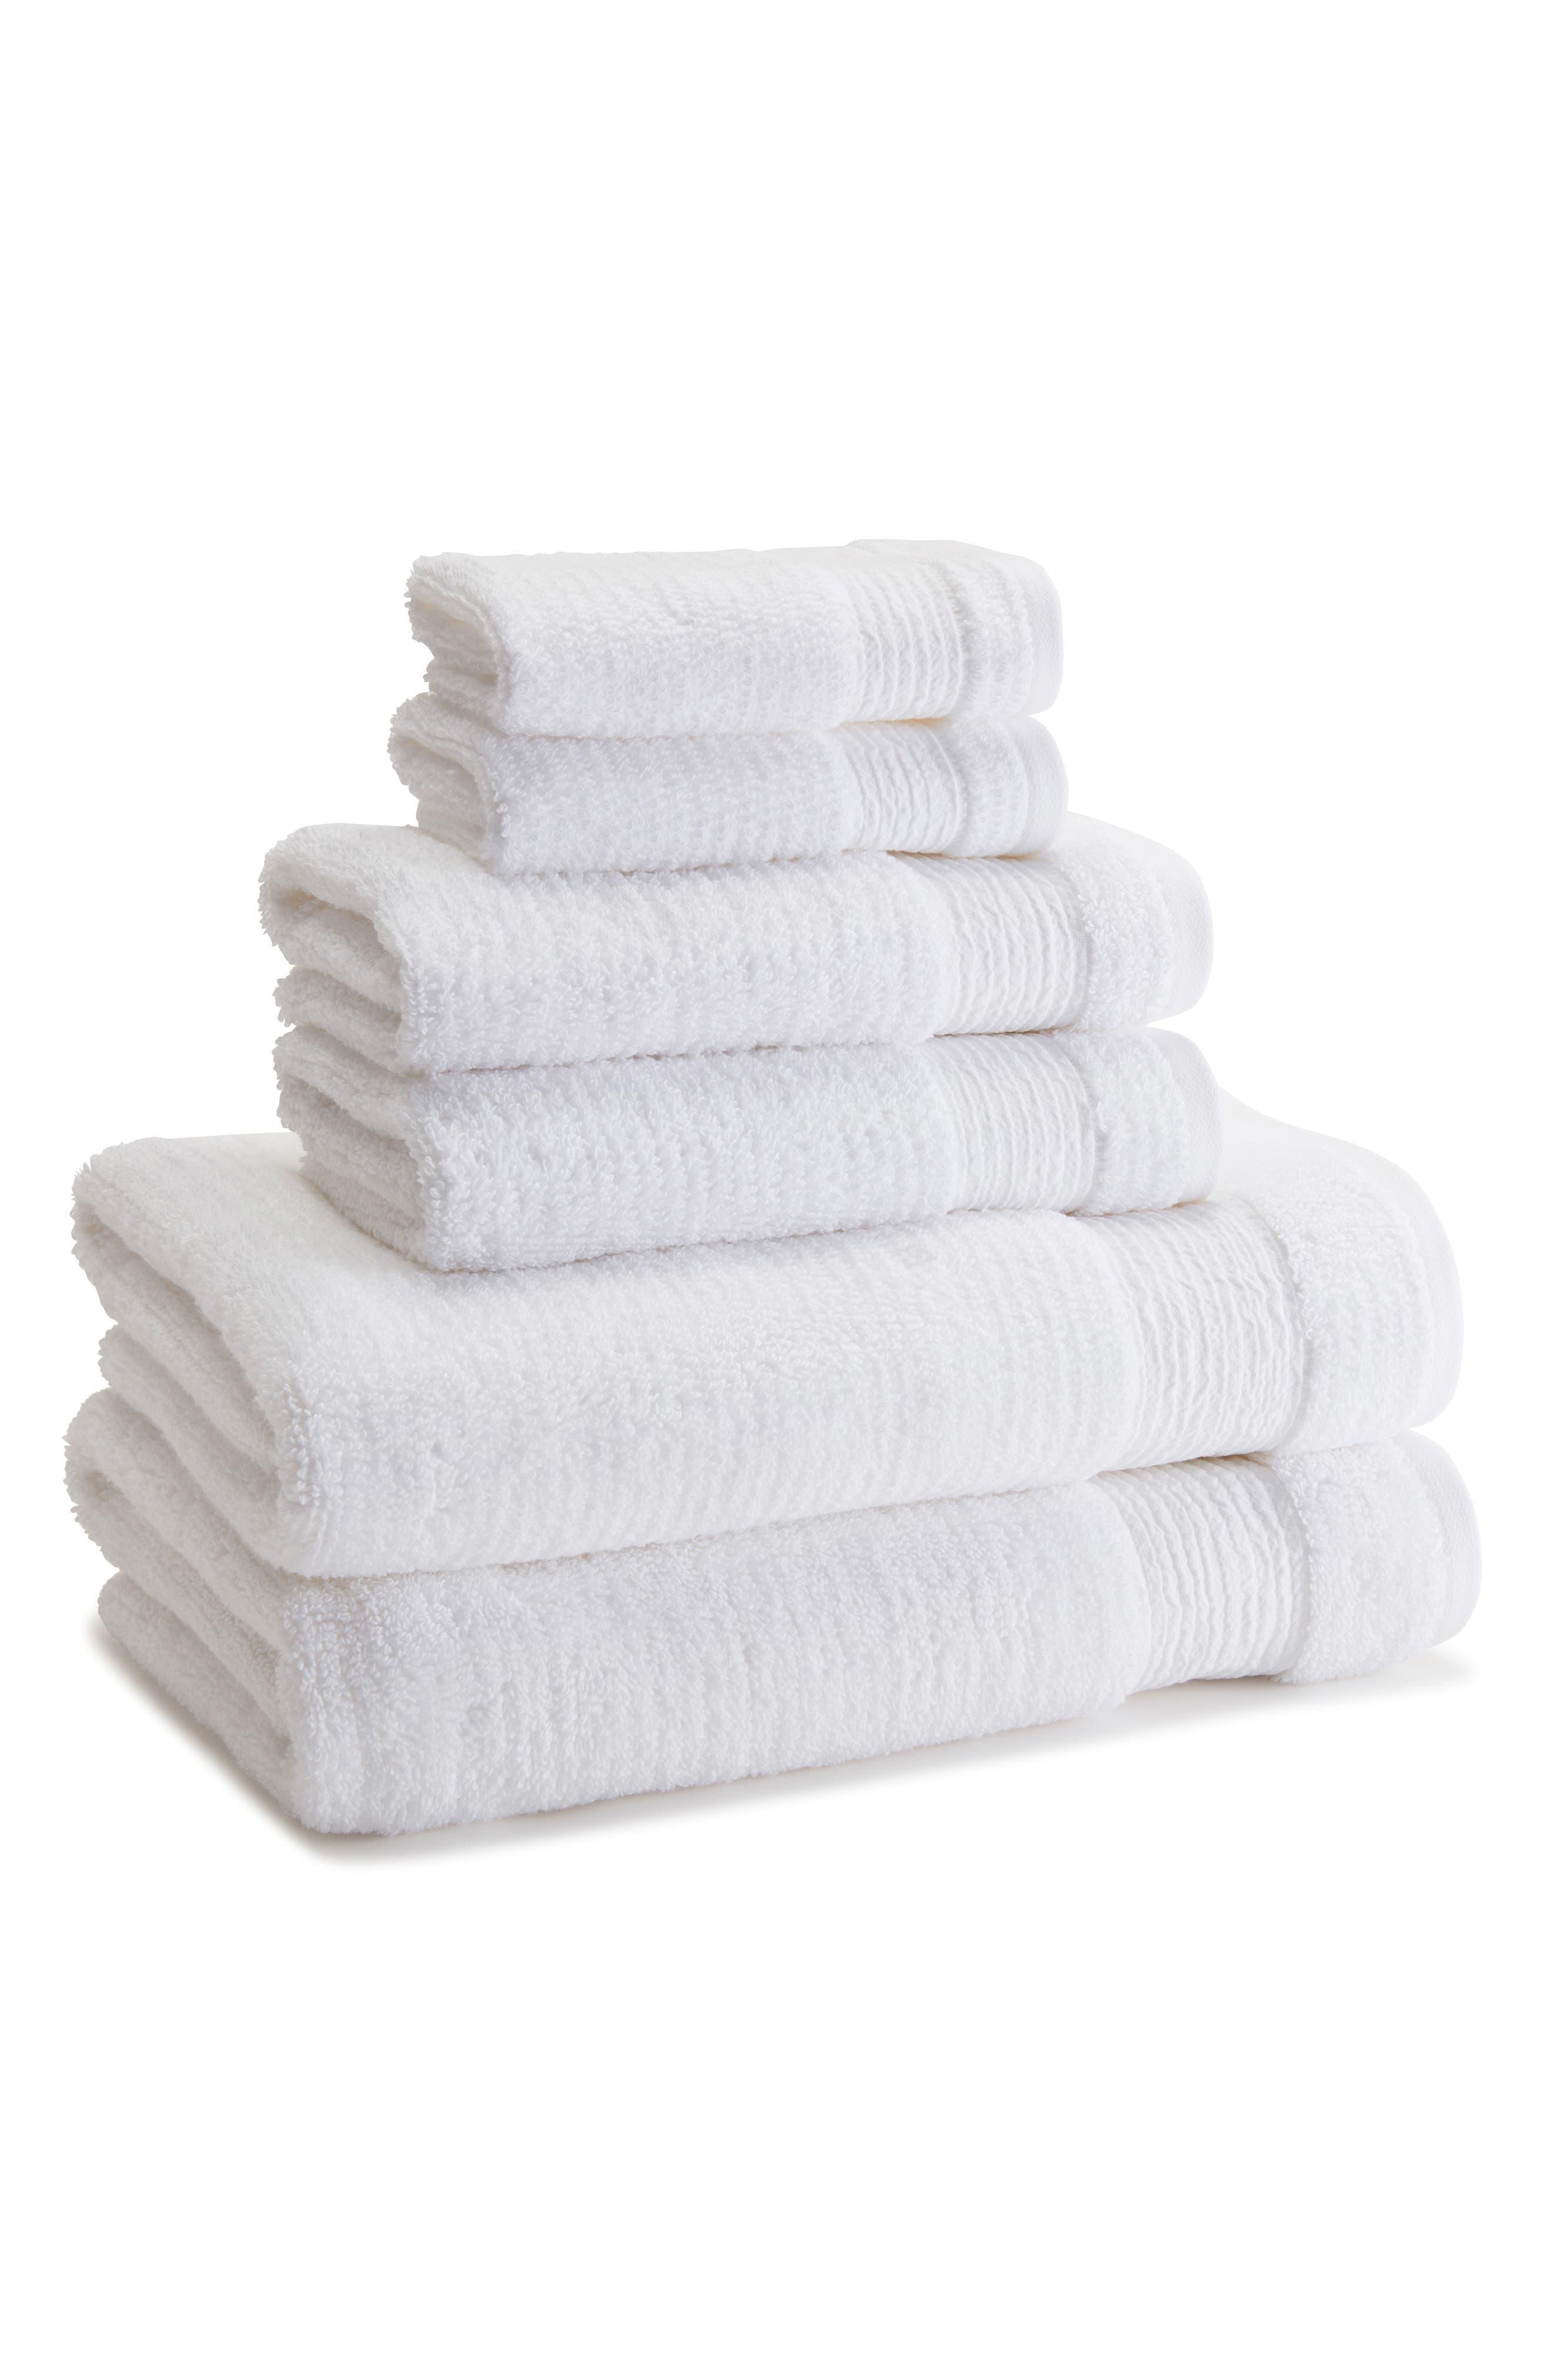 Kassatex Pergamon Hand Towel Size One Size  White